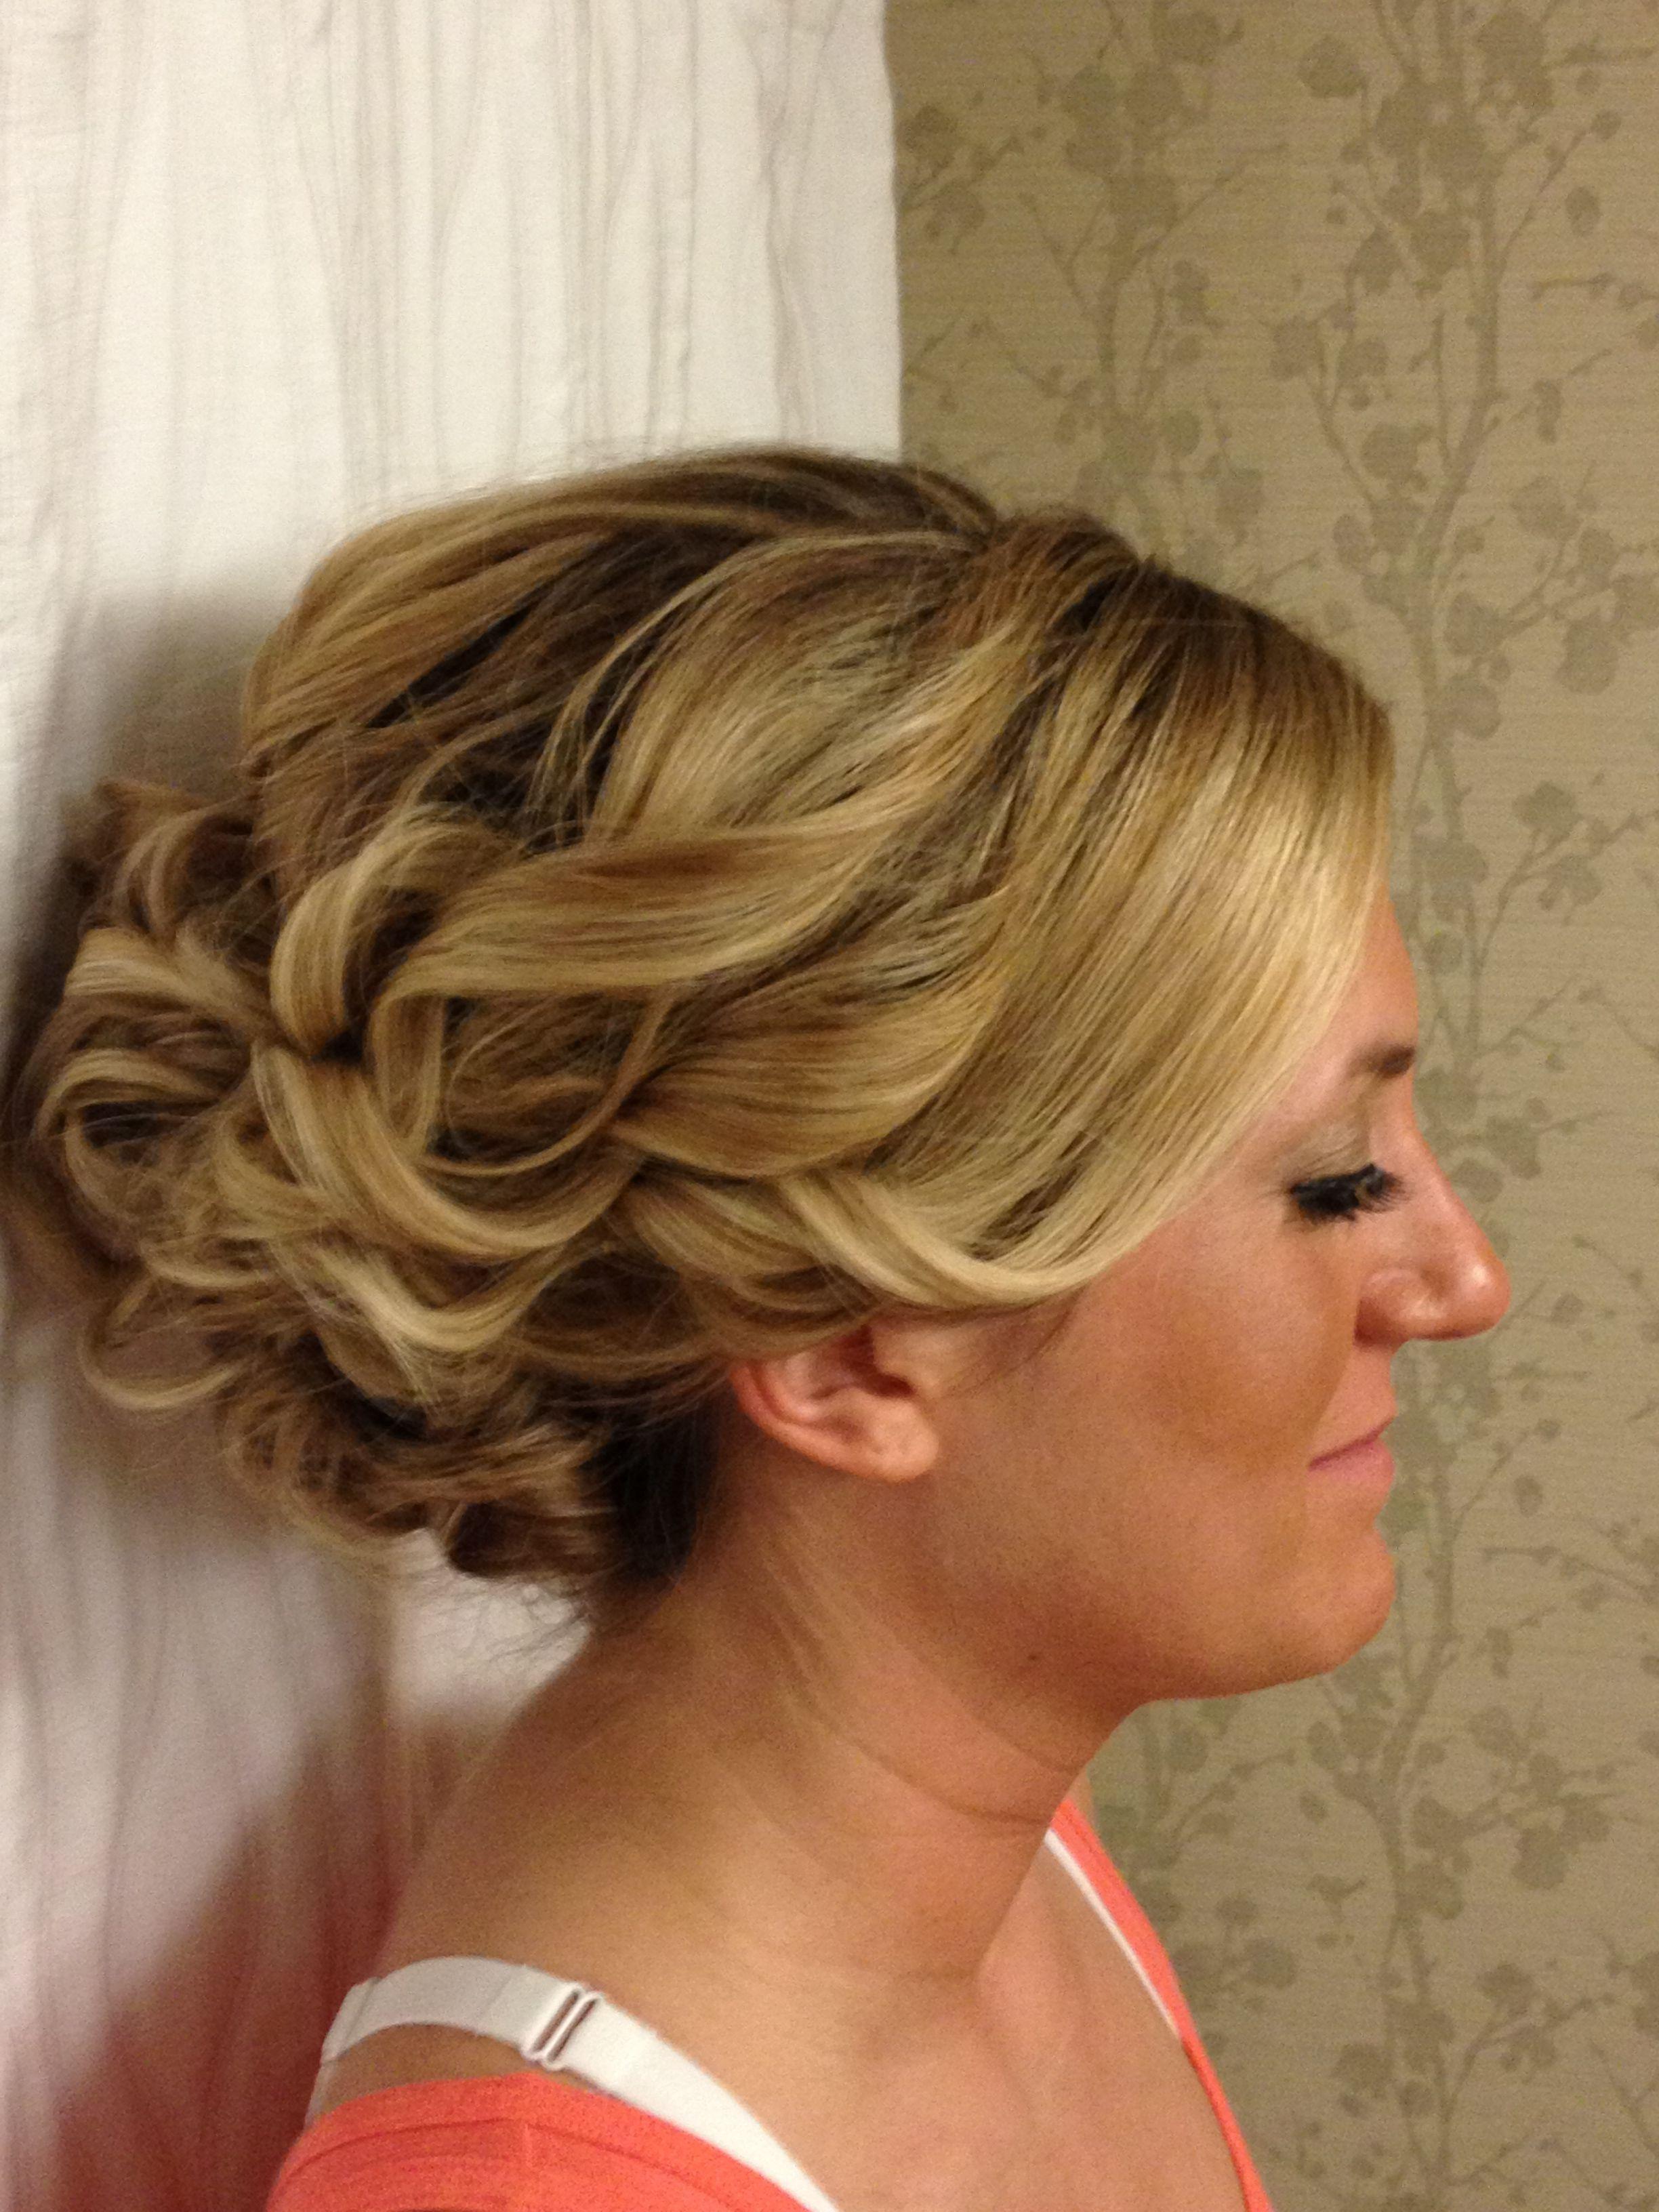 Wedding Hairstyles Thick Hair Alternative Long Thick Hair Thick Hair Styles Hair Styles